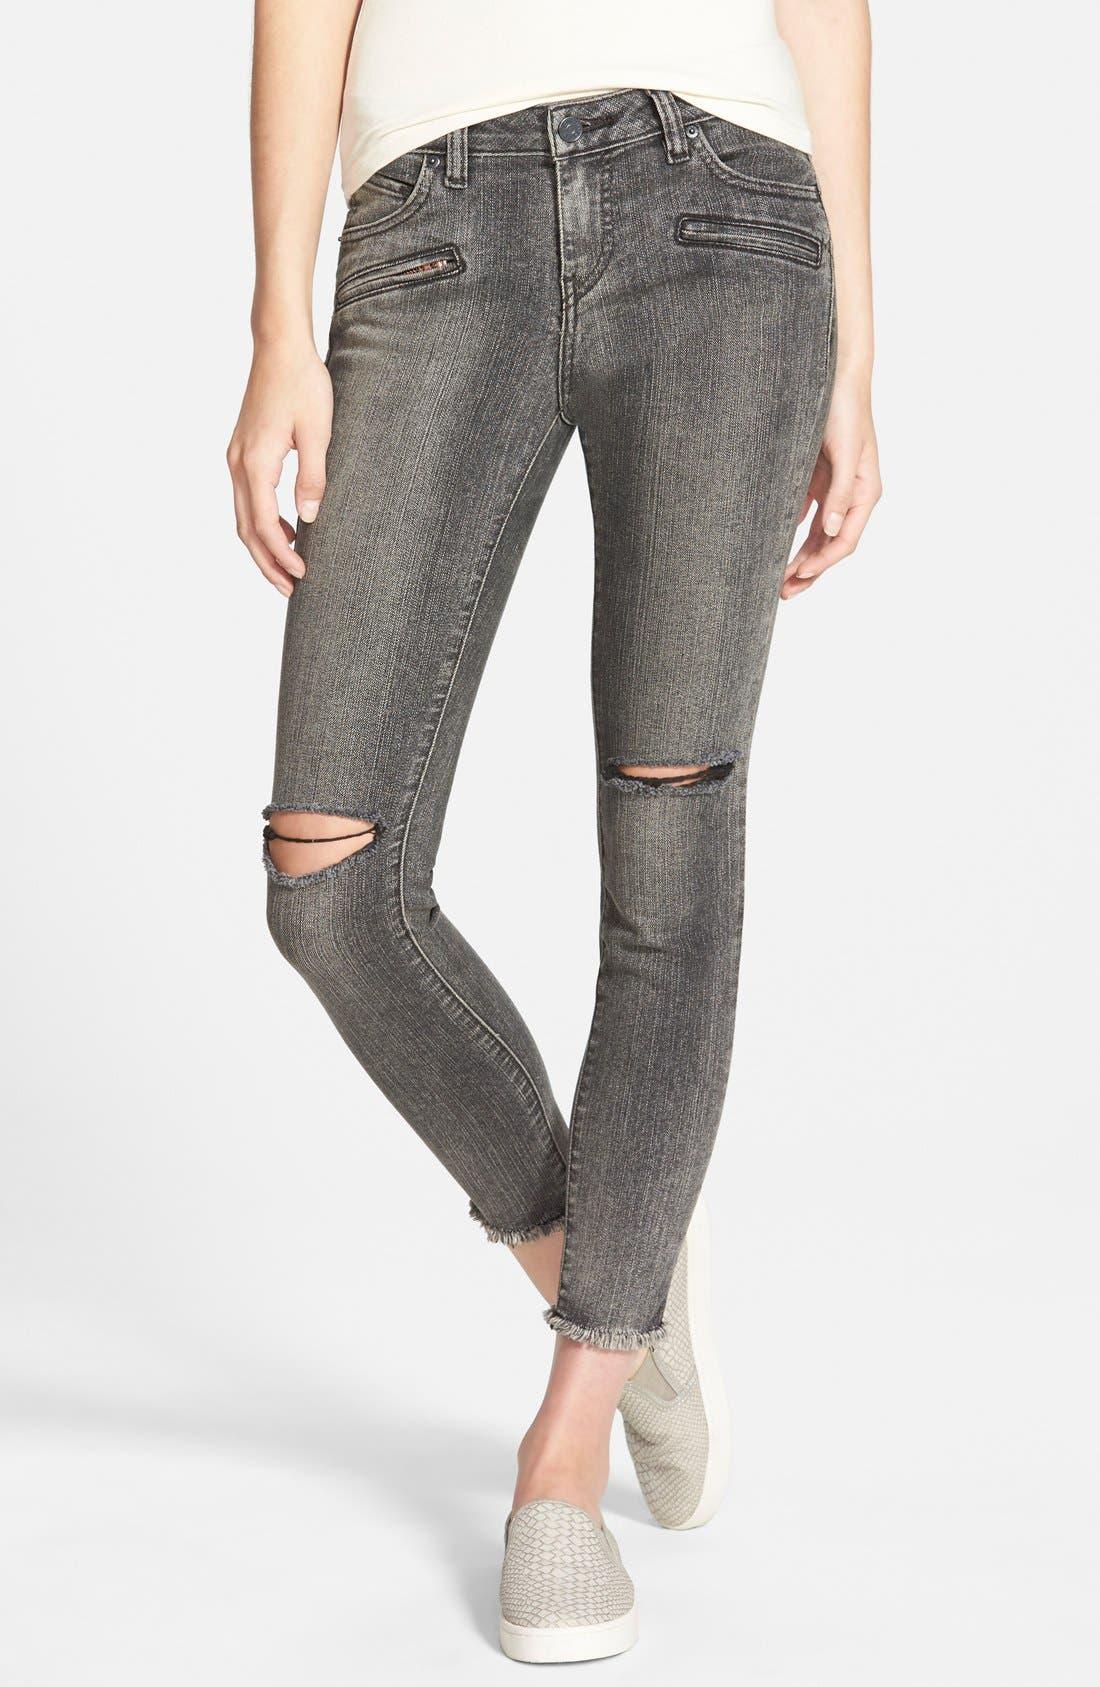 Alternate Image 1 Selected - Volcom Destroyed Cropped Jeans (Gunmetal Grey)